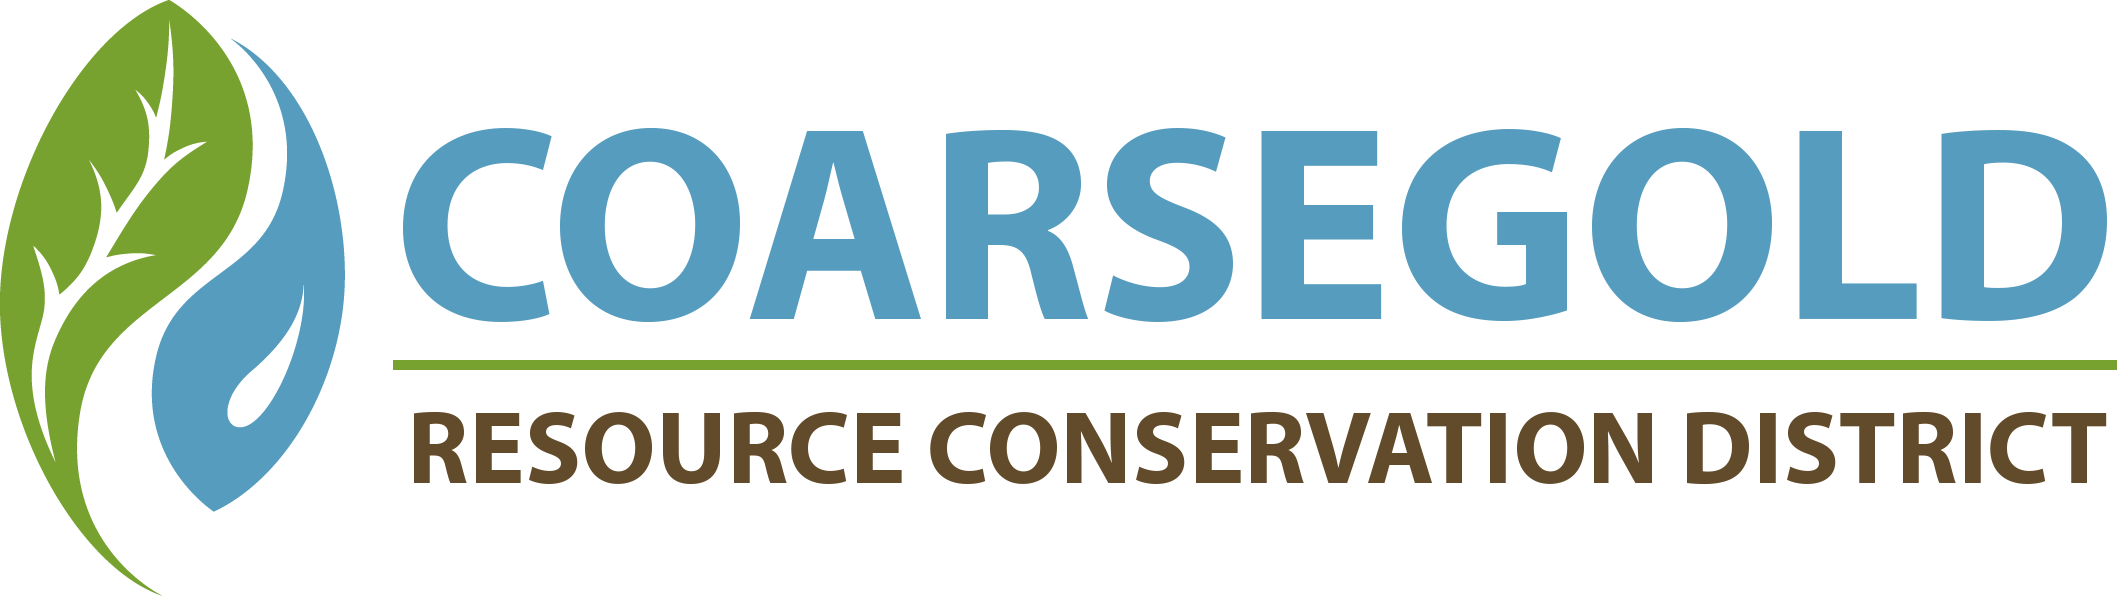 coarsegold rcd logo